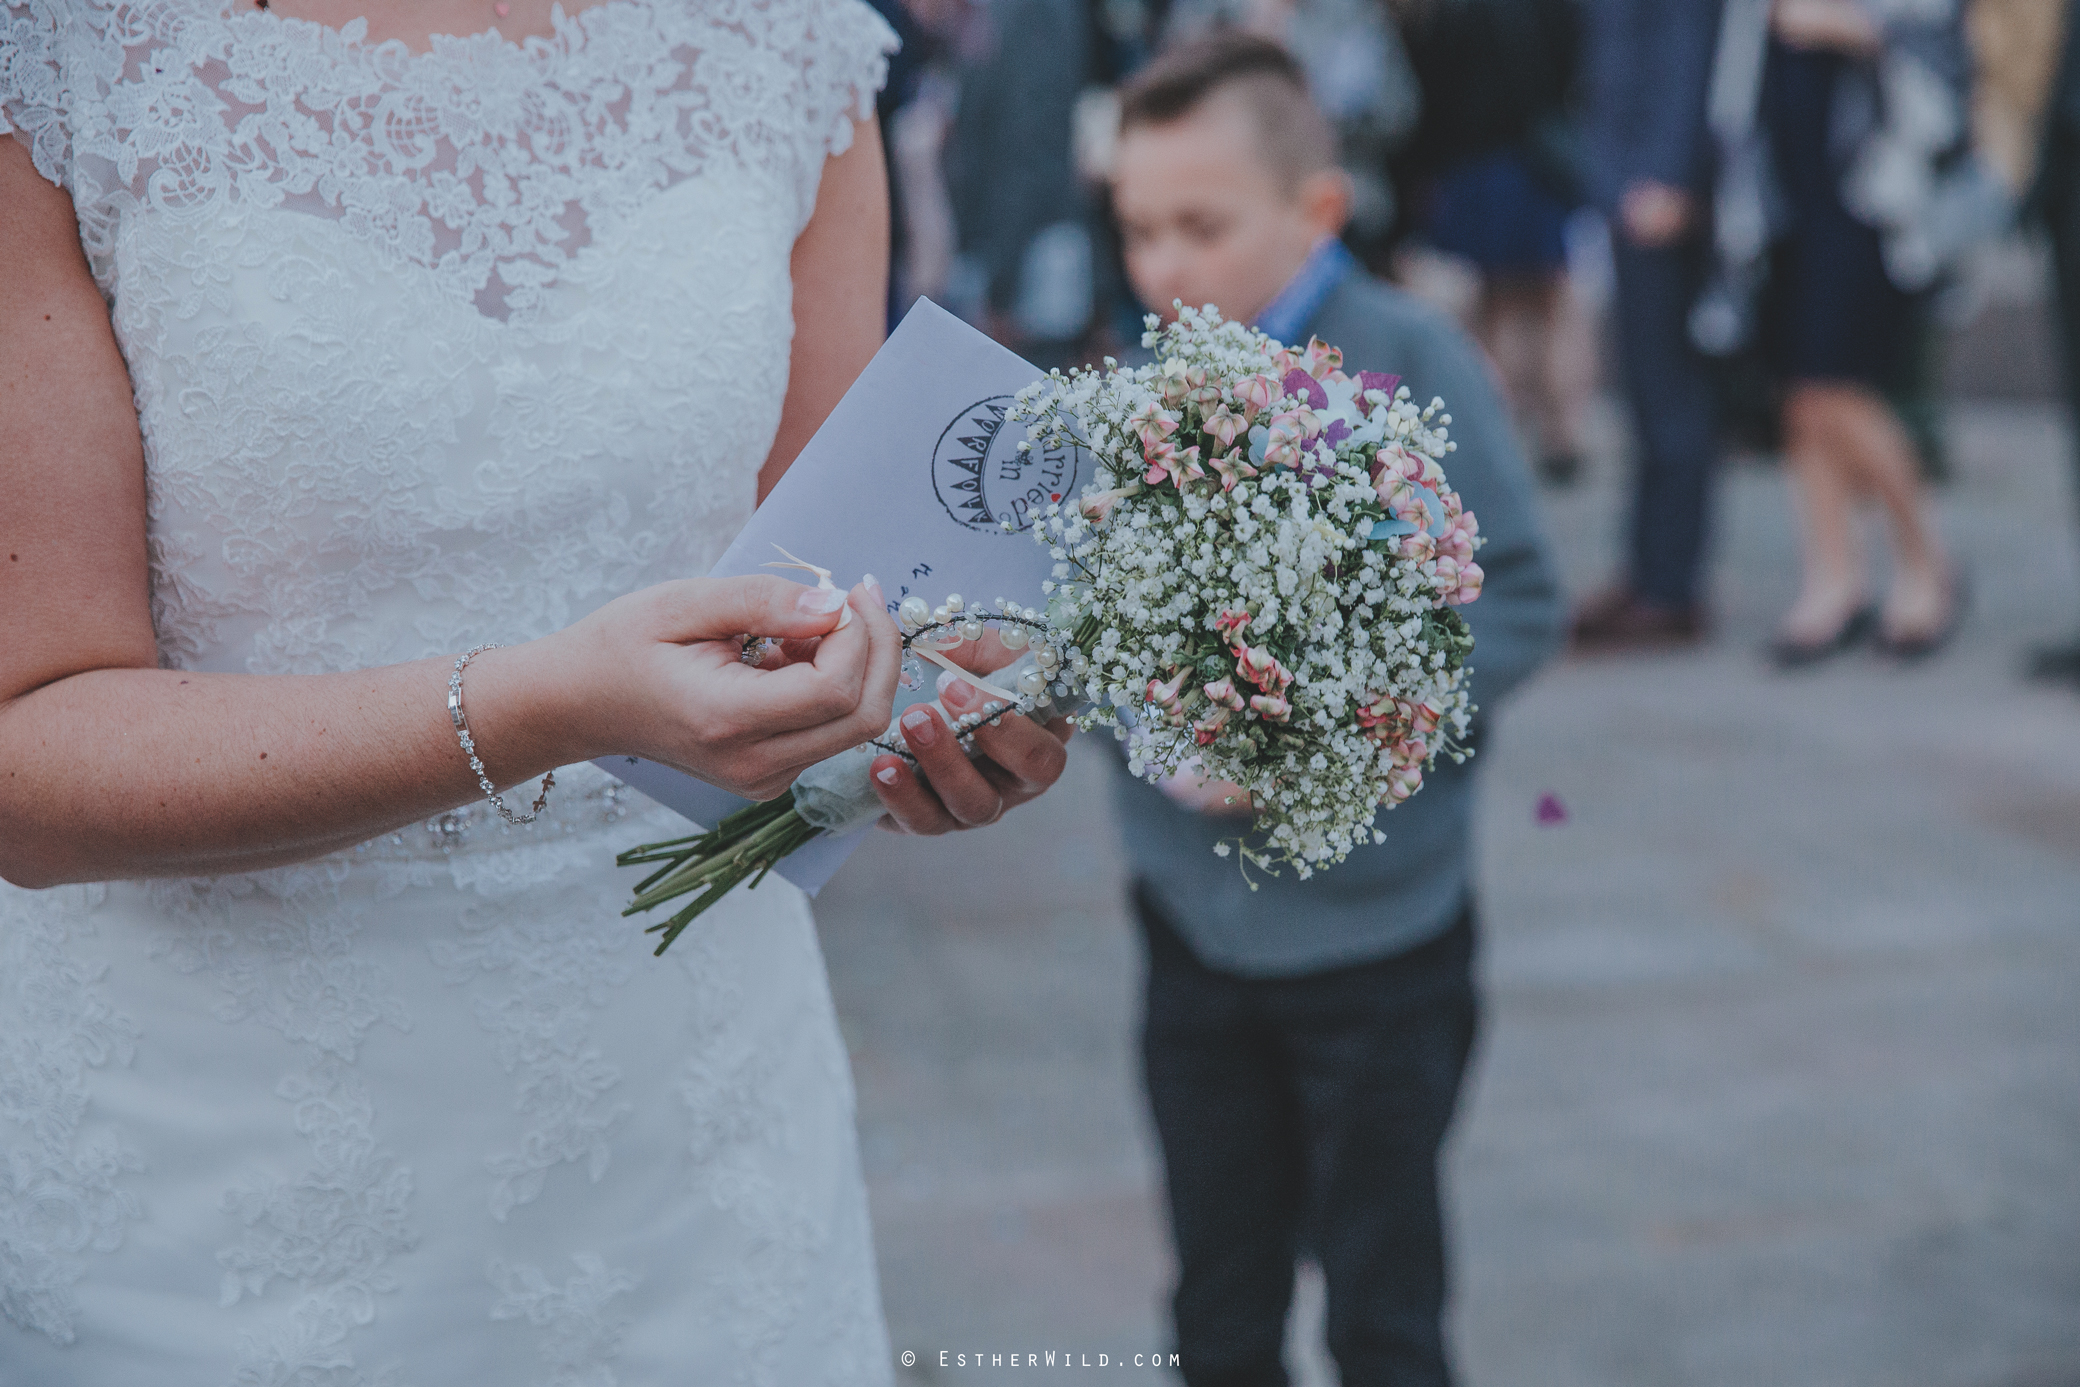 Wedding_Kings_Lynn_Town_Hall_Norfolk_Photographer_Esther_Wild_IMG_1262.jpg